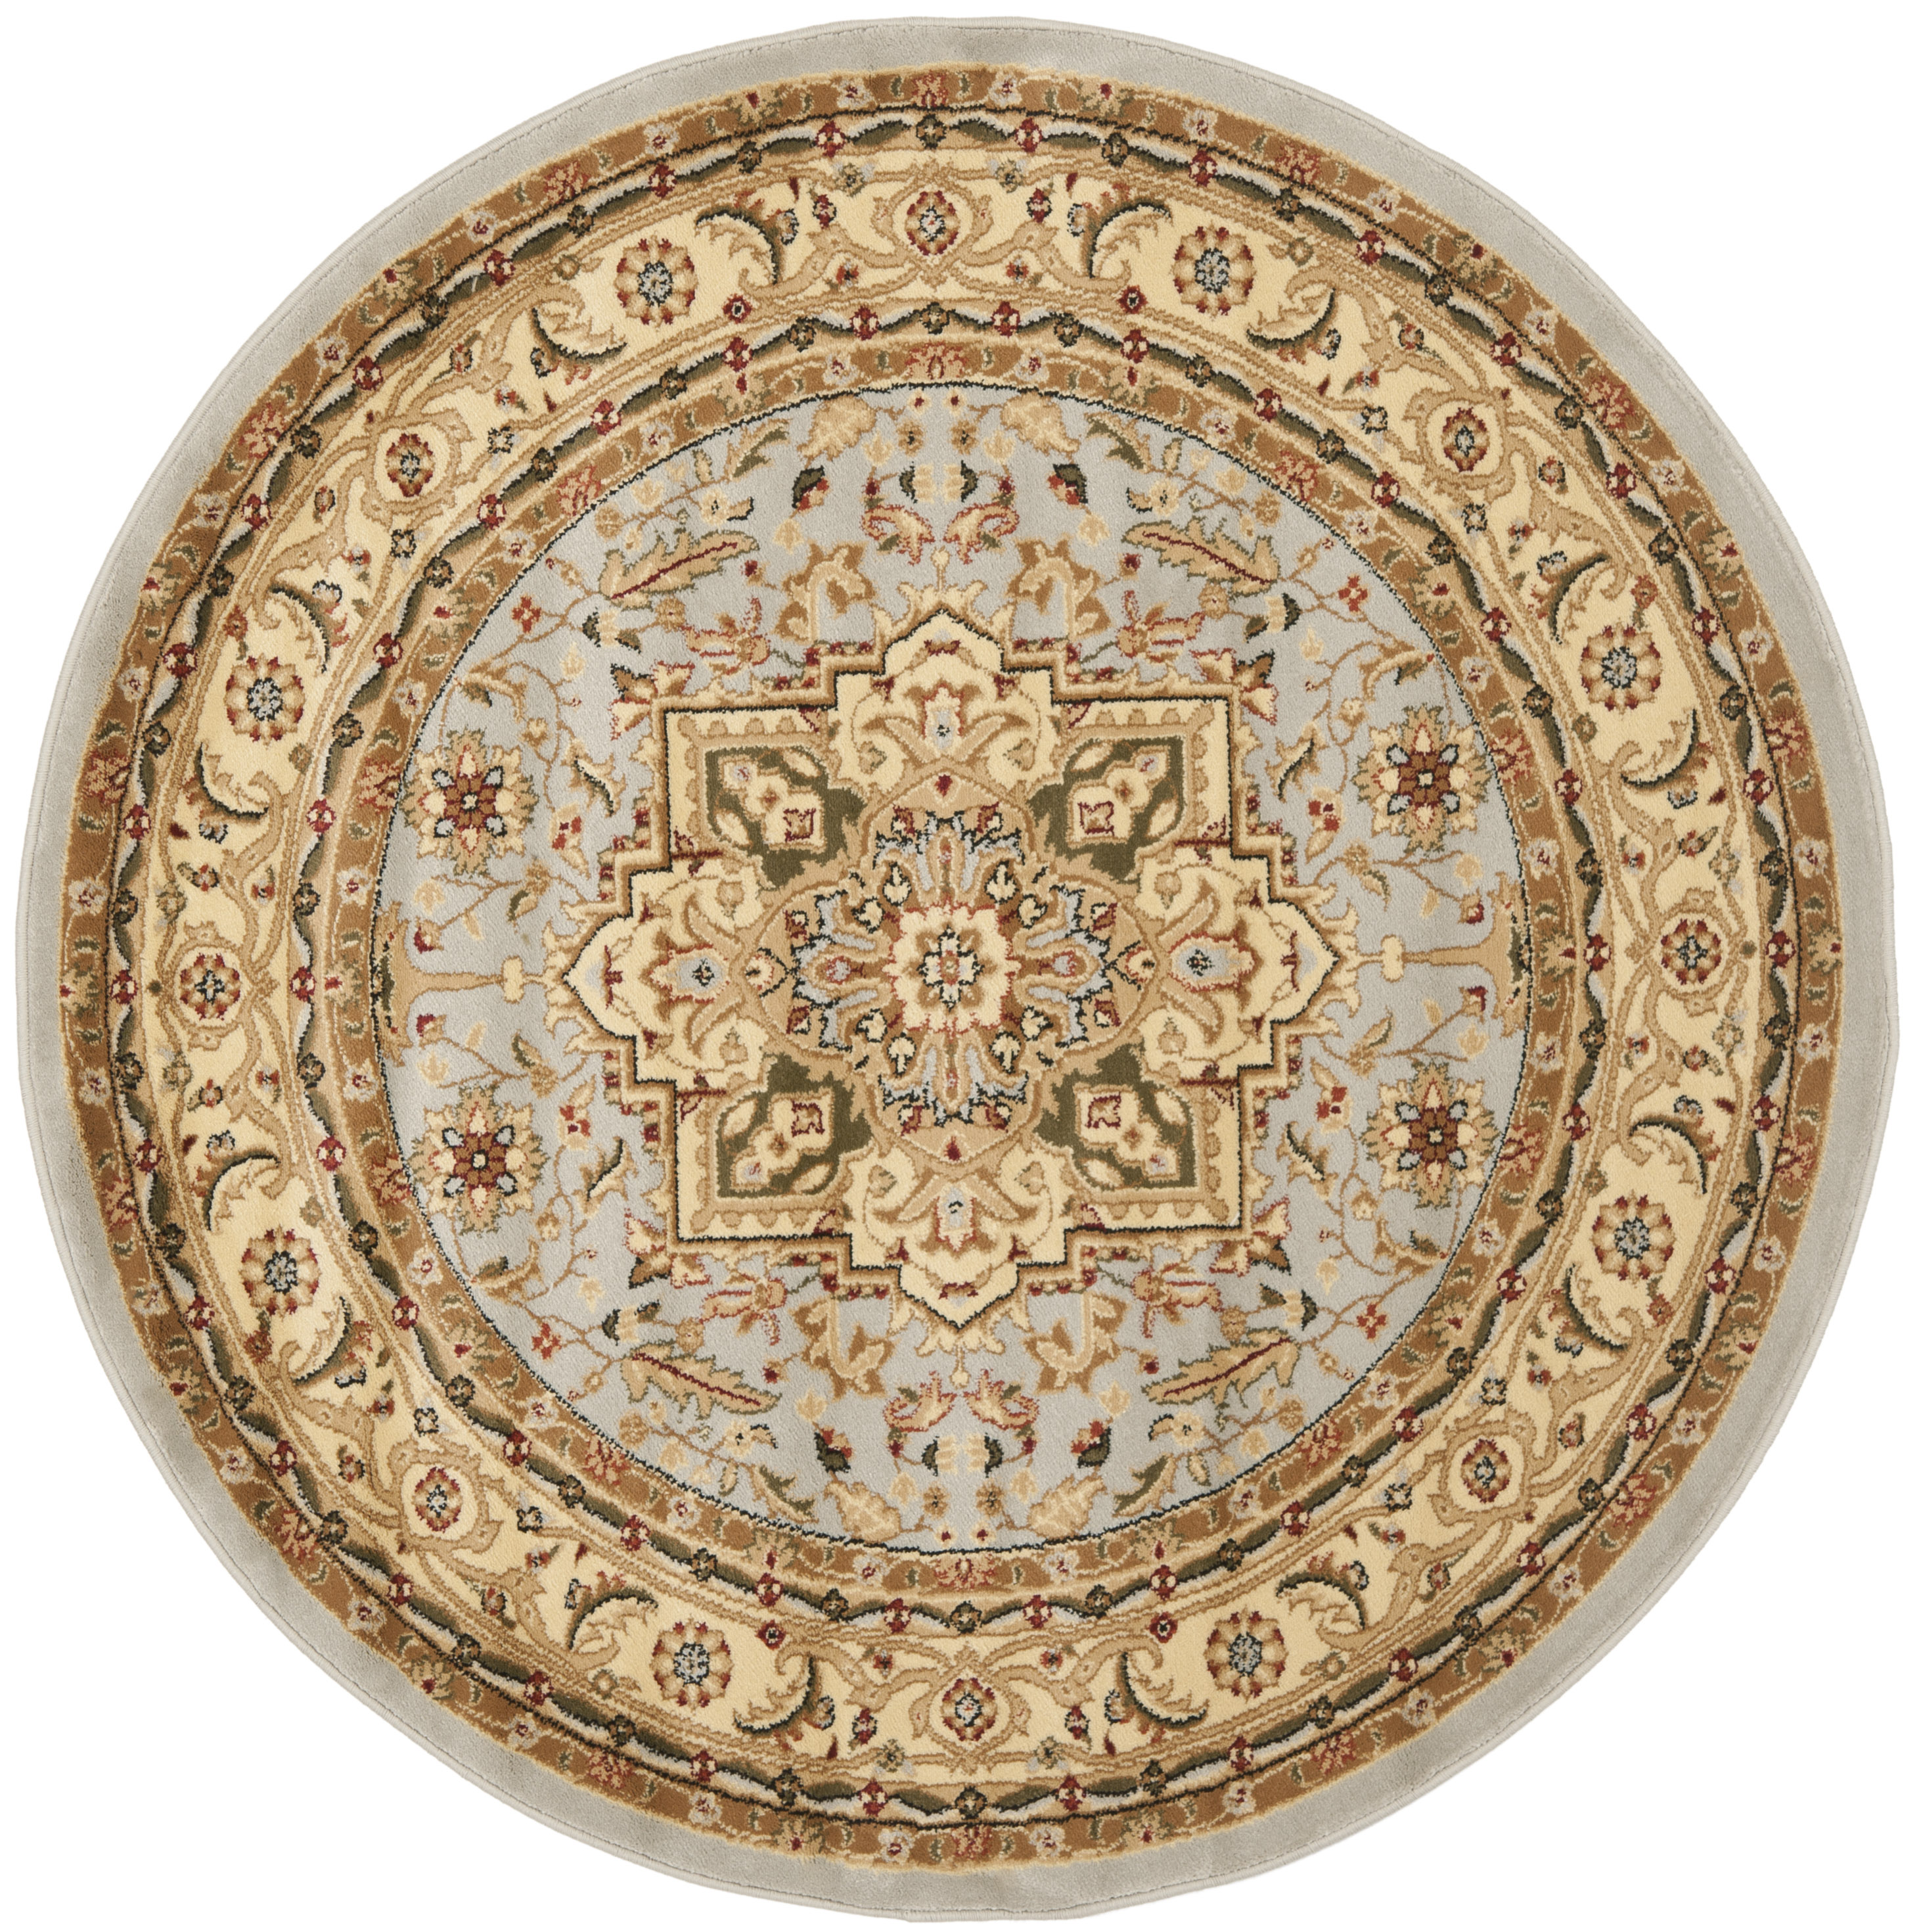 Safavieh Lyndhurst Heriz Gray/Beige Round Indoor Machine-made Oriental Area Rug (Common: 5 x 5; Actual: 5.25-ft W x 5.25-ft L x 5.25-ft Dia)